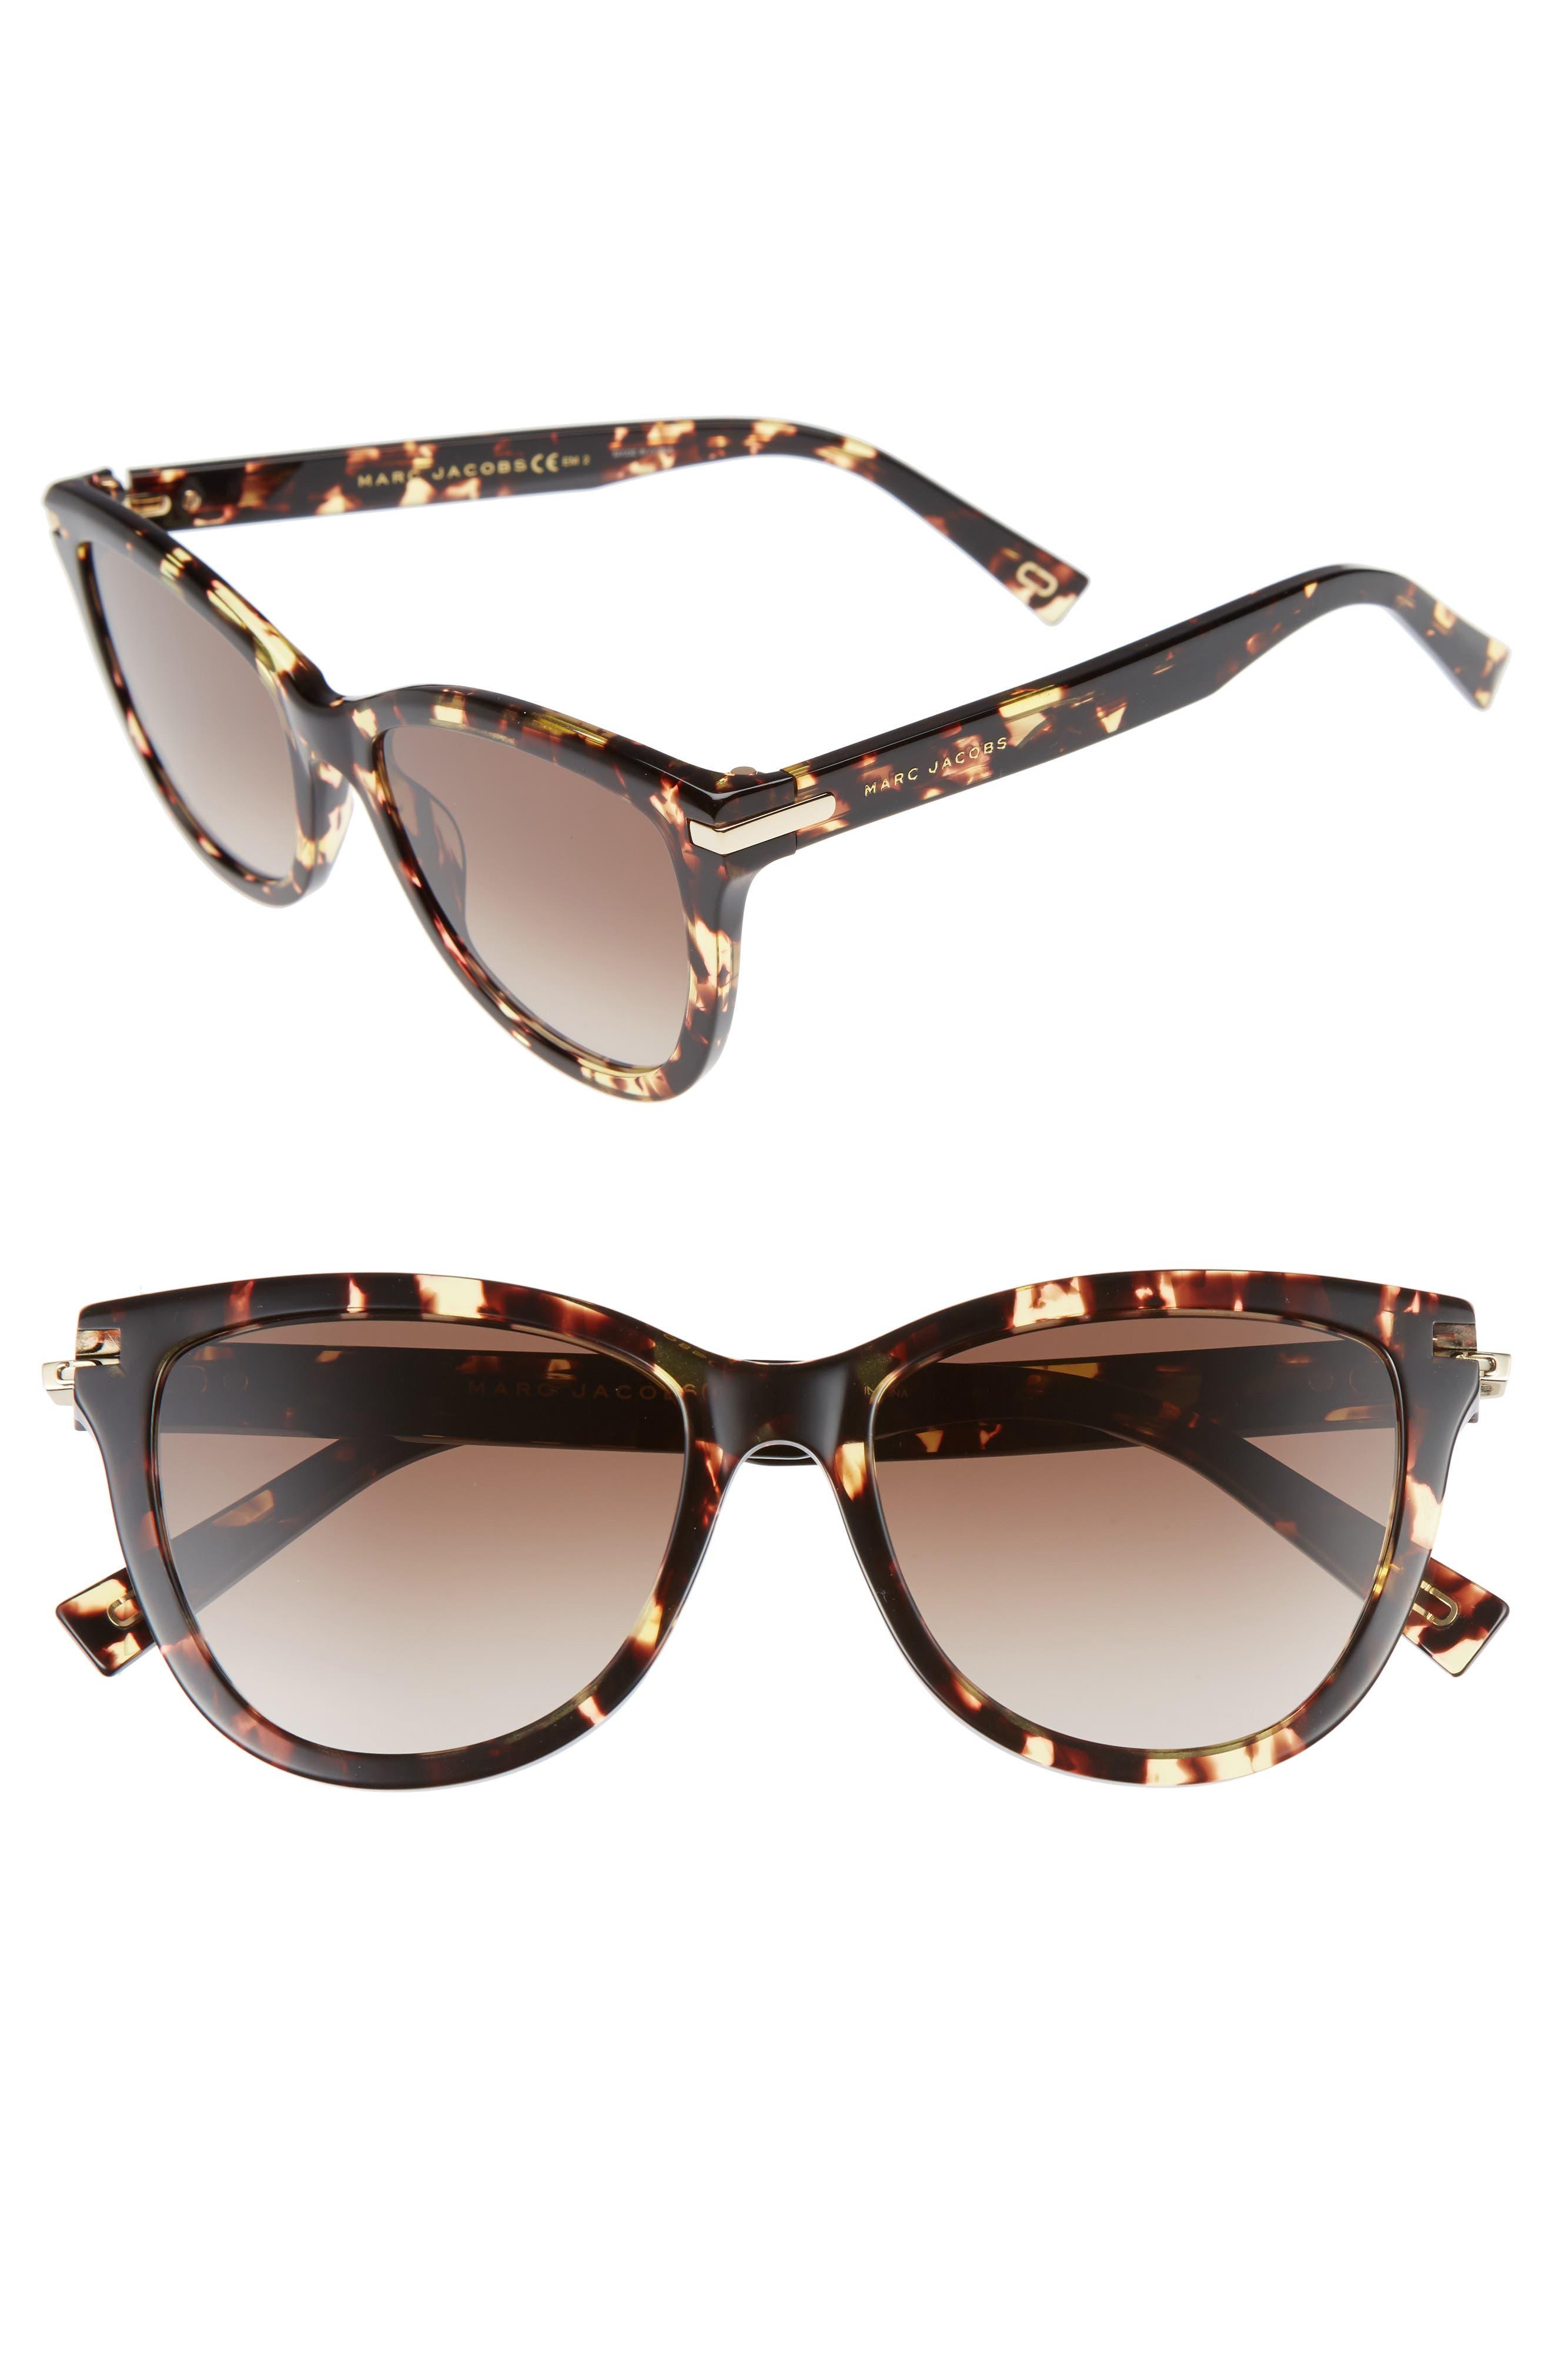 MARC JACOBS,                             54mm Sunglasses,                             Main thumbnail 1, color,                             CRYSTAL HAVANA